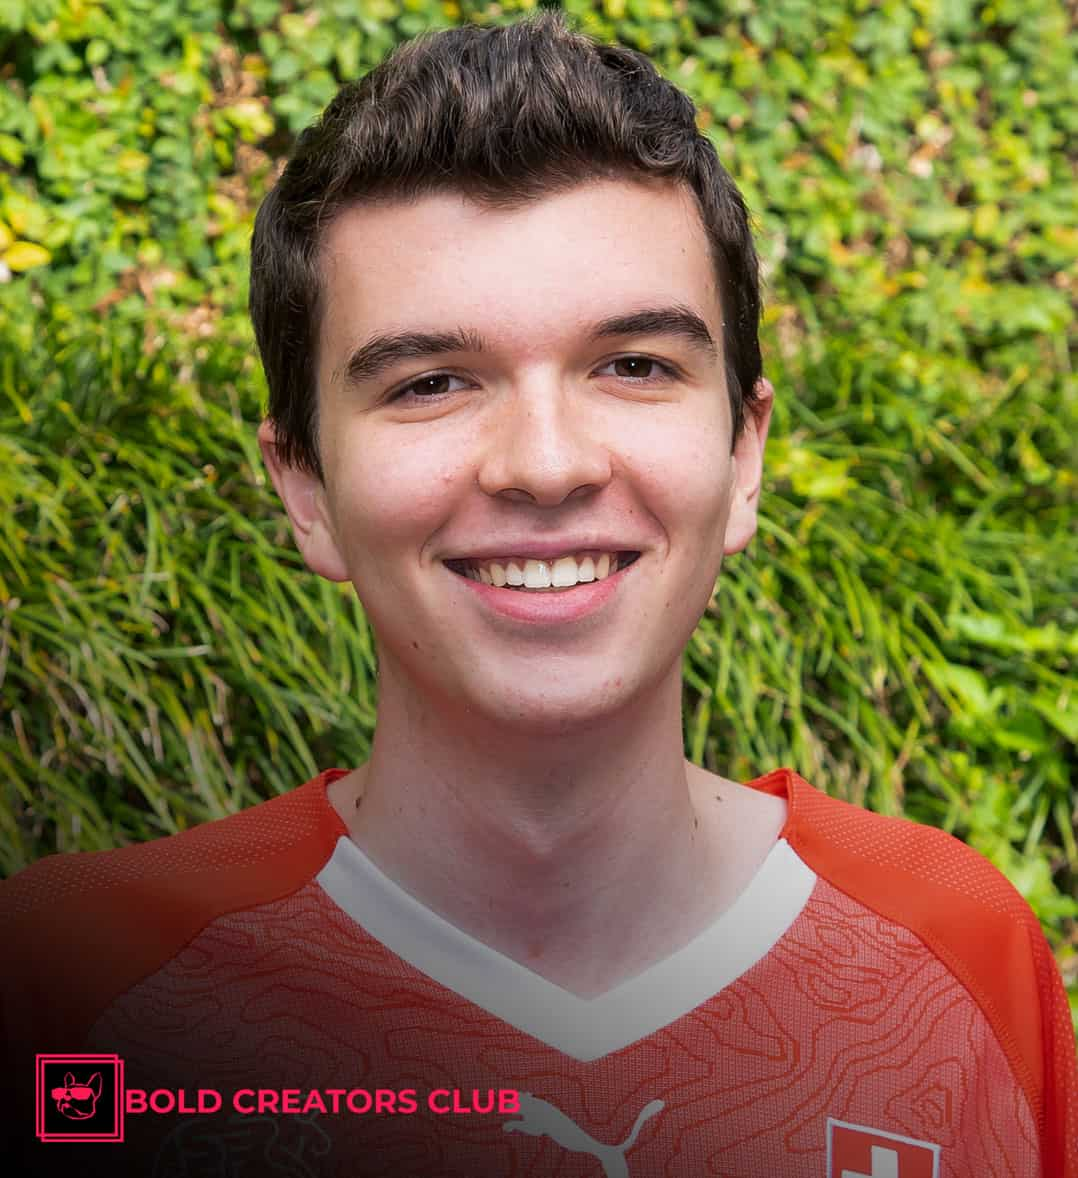 Francisco Vieira Bold Creators Club Influencer Marketing Agency South America Brazil